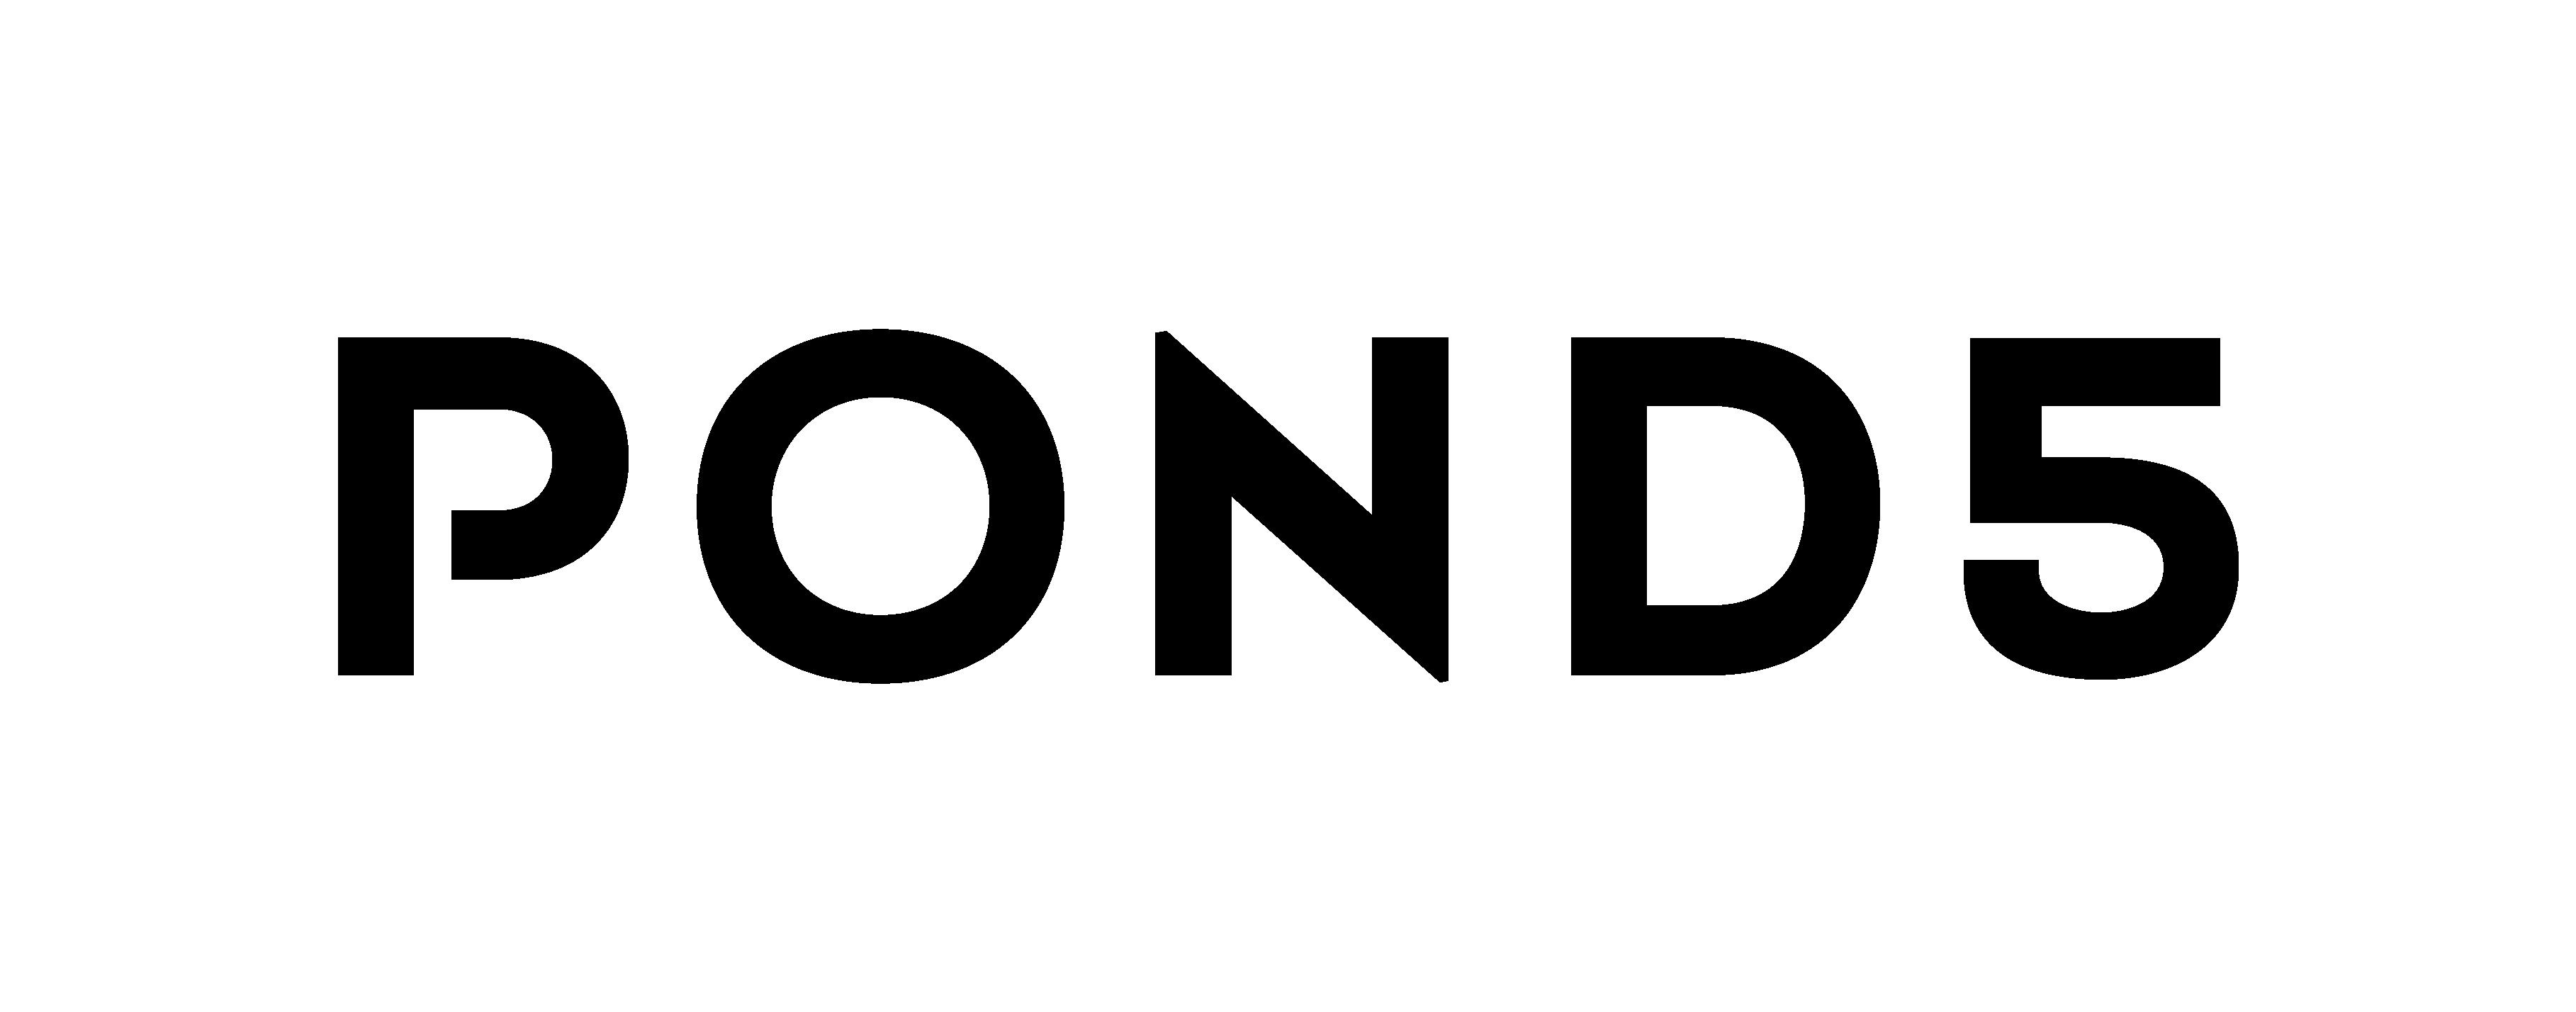 pond5-logo (1)